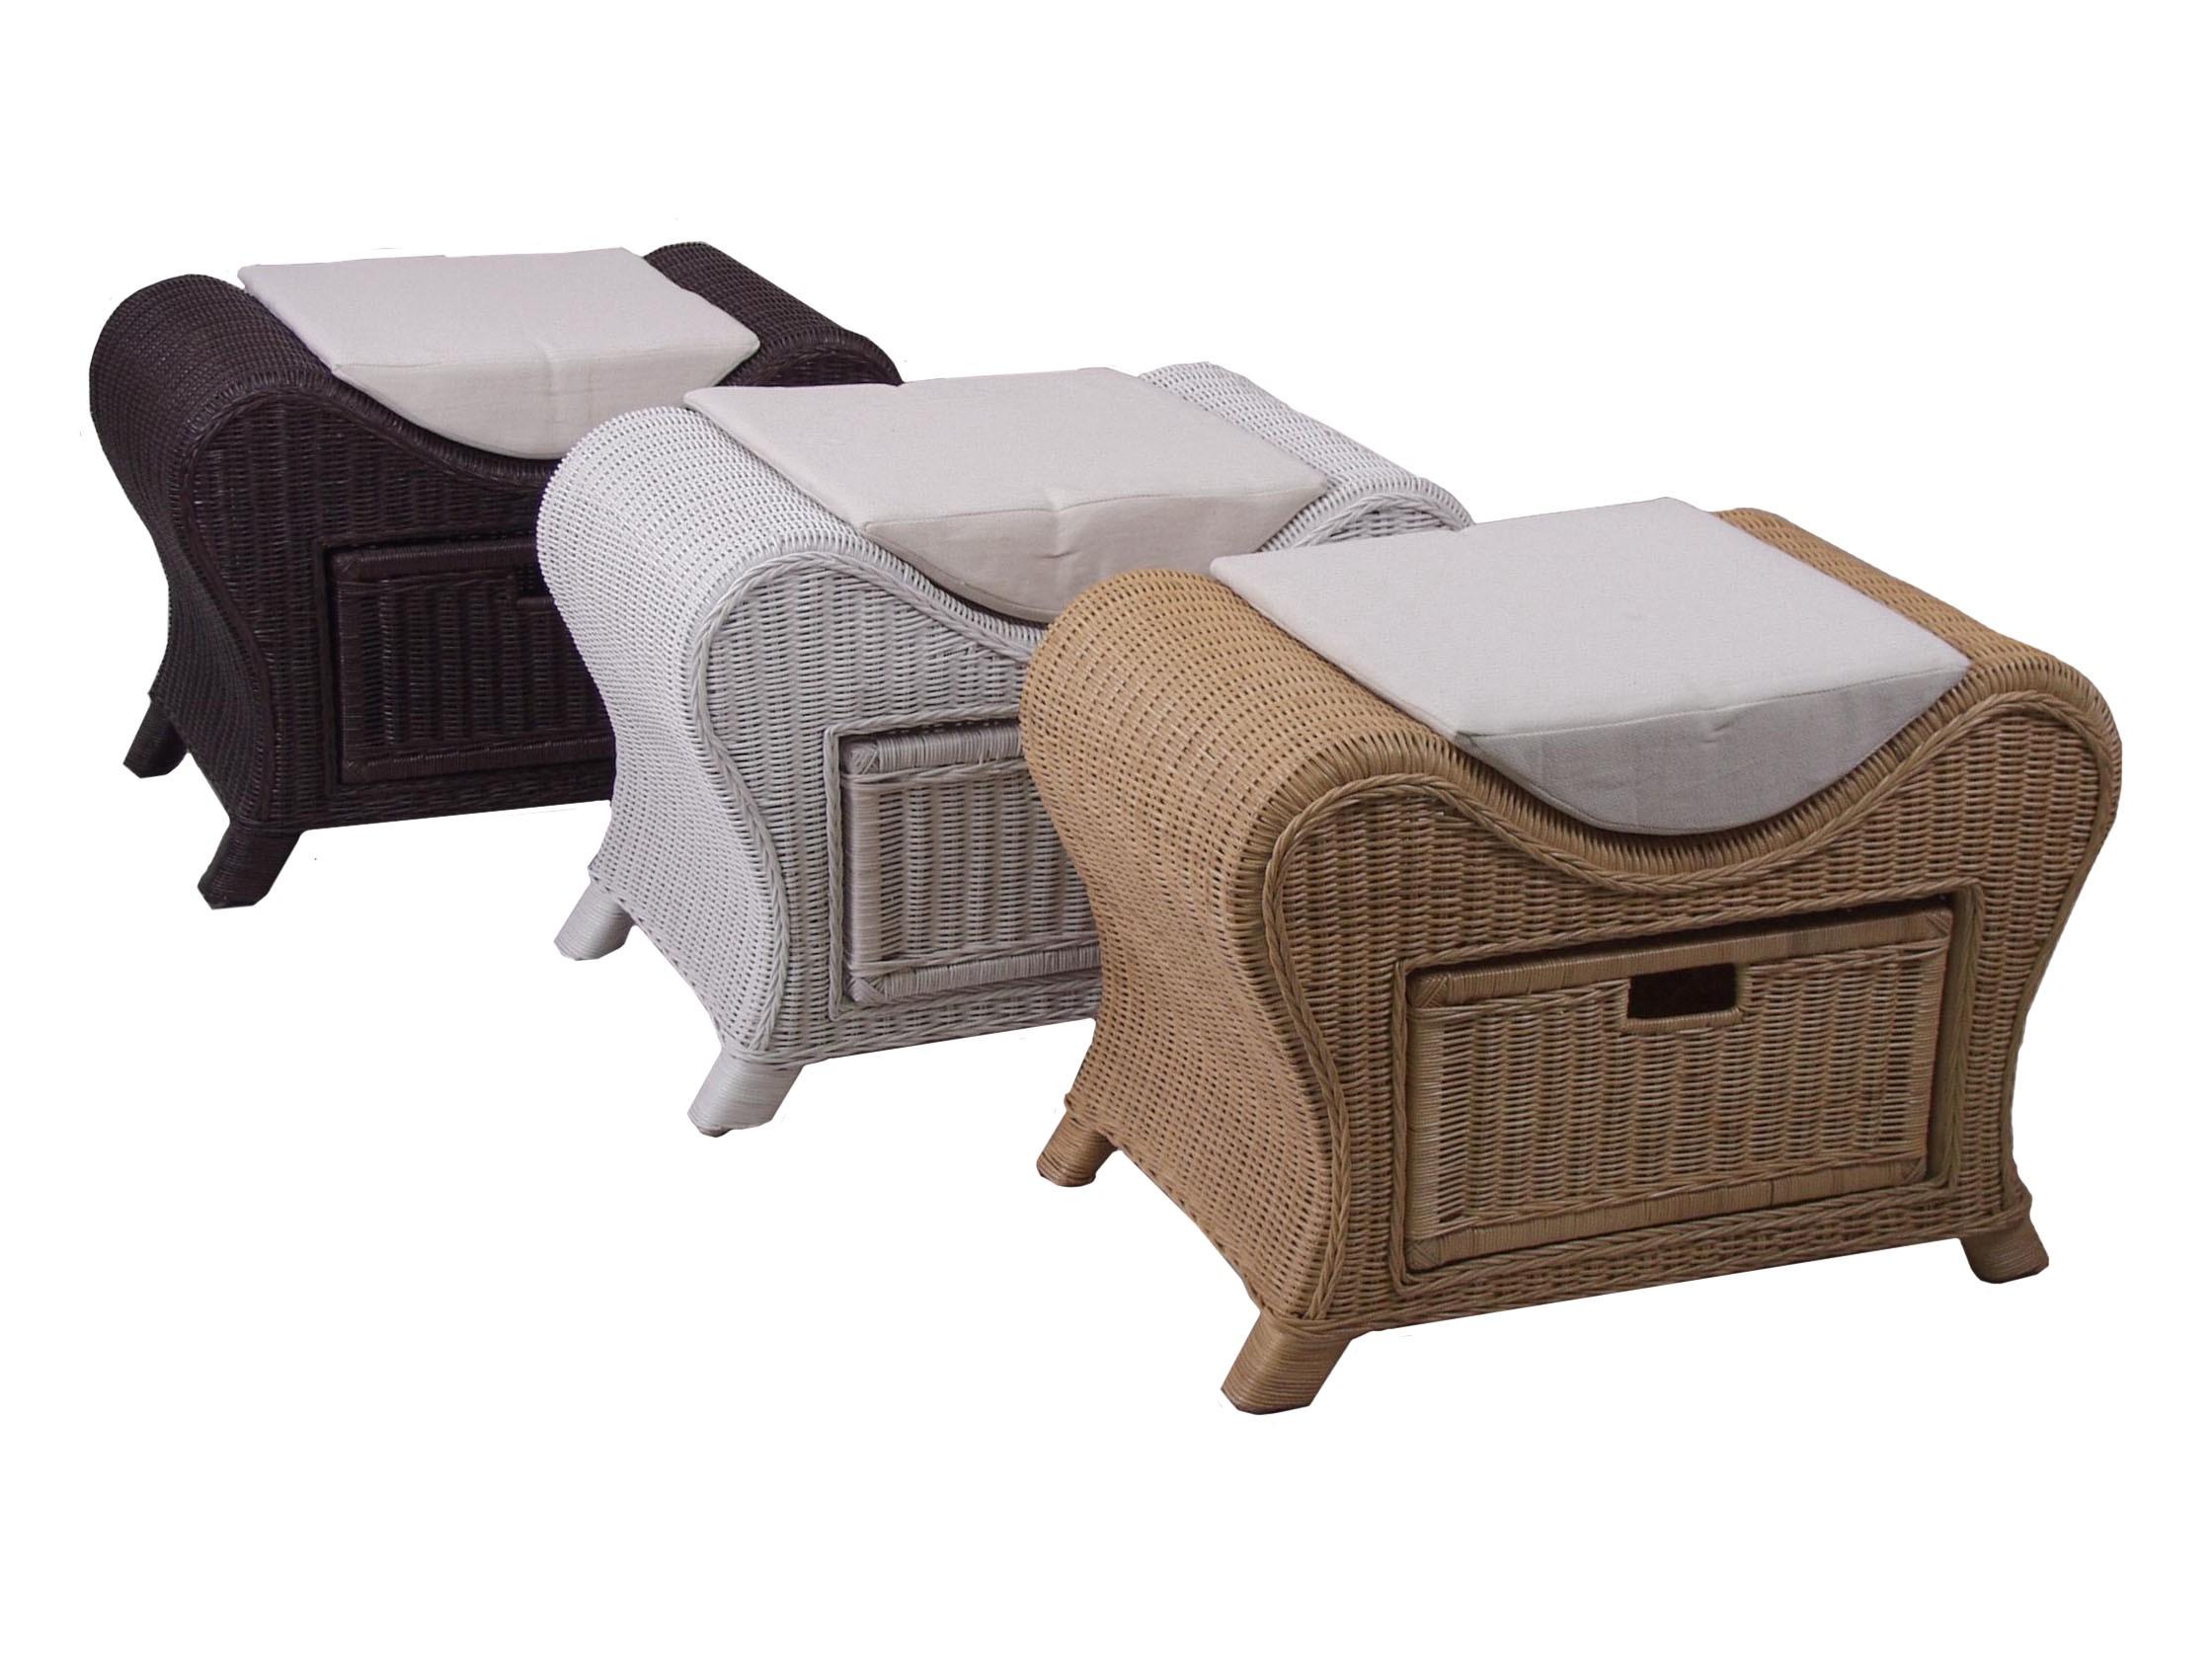 sitztruhe weiss. Black Bedroom Furniture Sets. Home Design Ideas